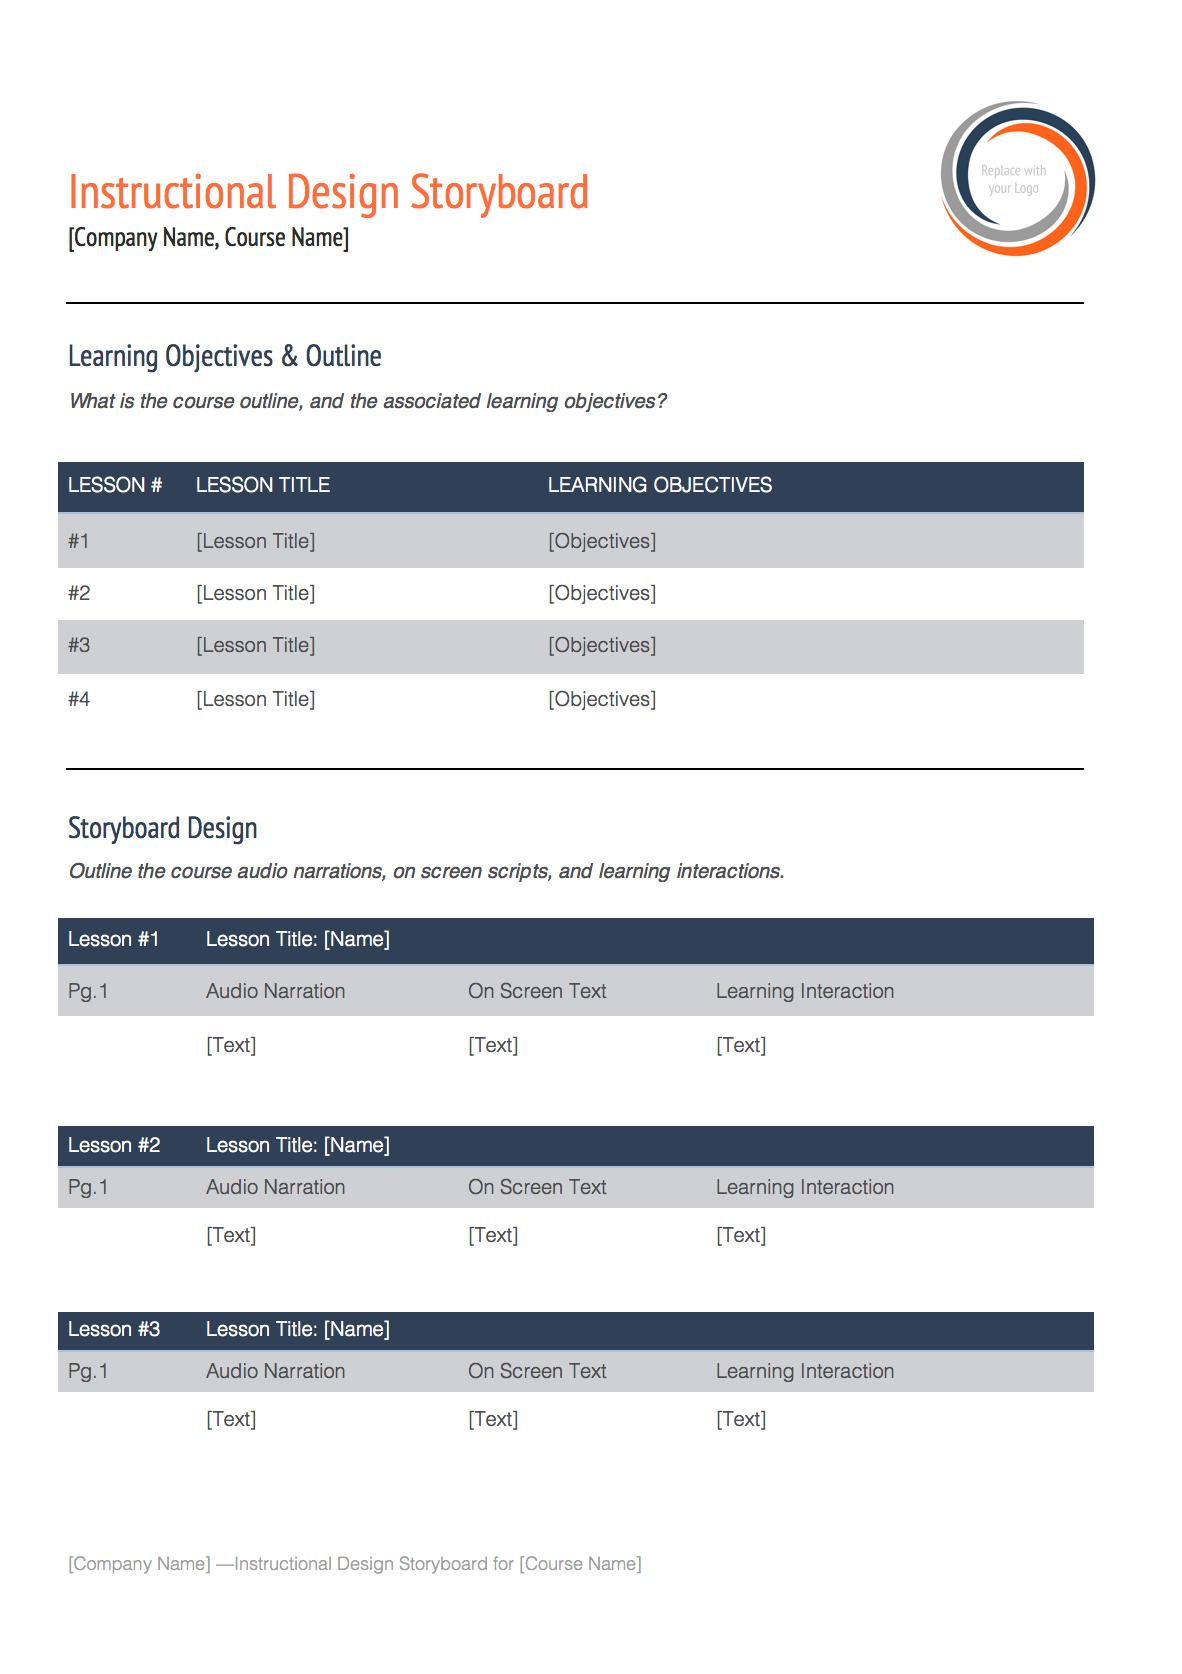 instructional design storyboard software